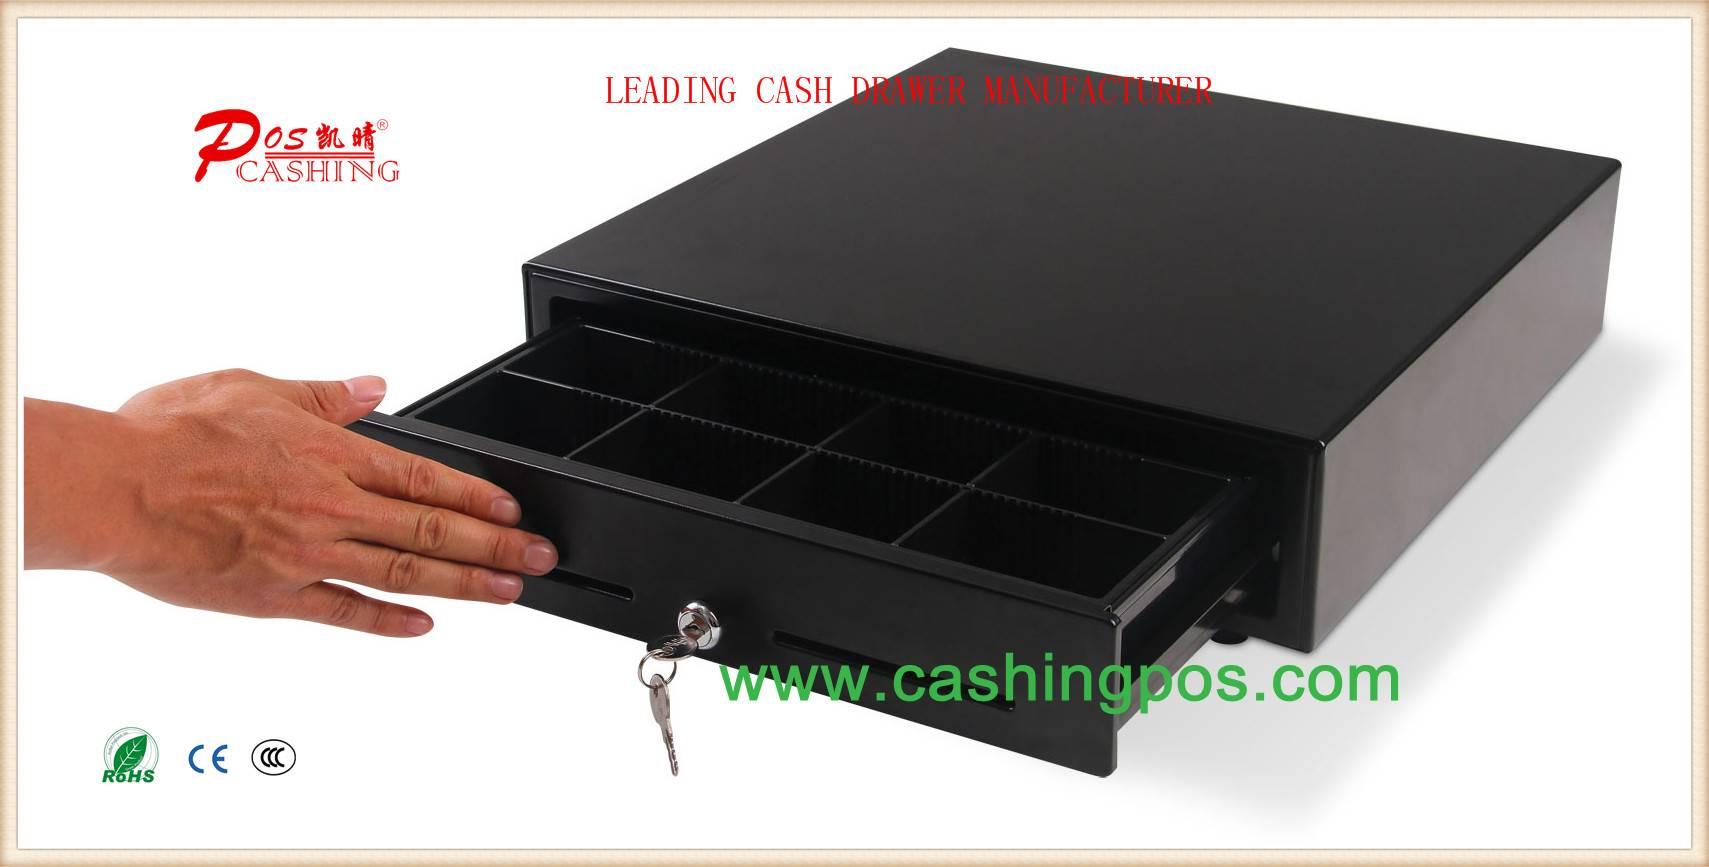 QT-410 Touch Cash Drawer